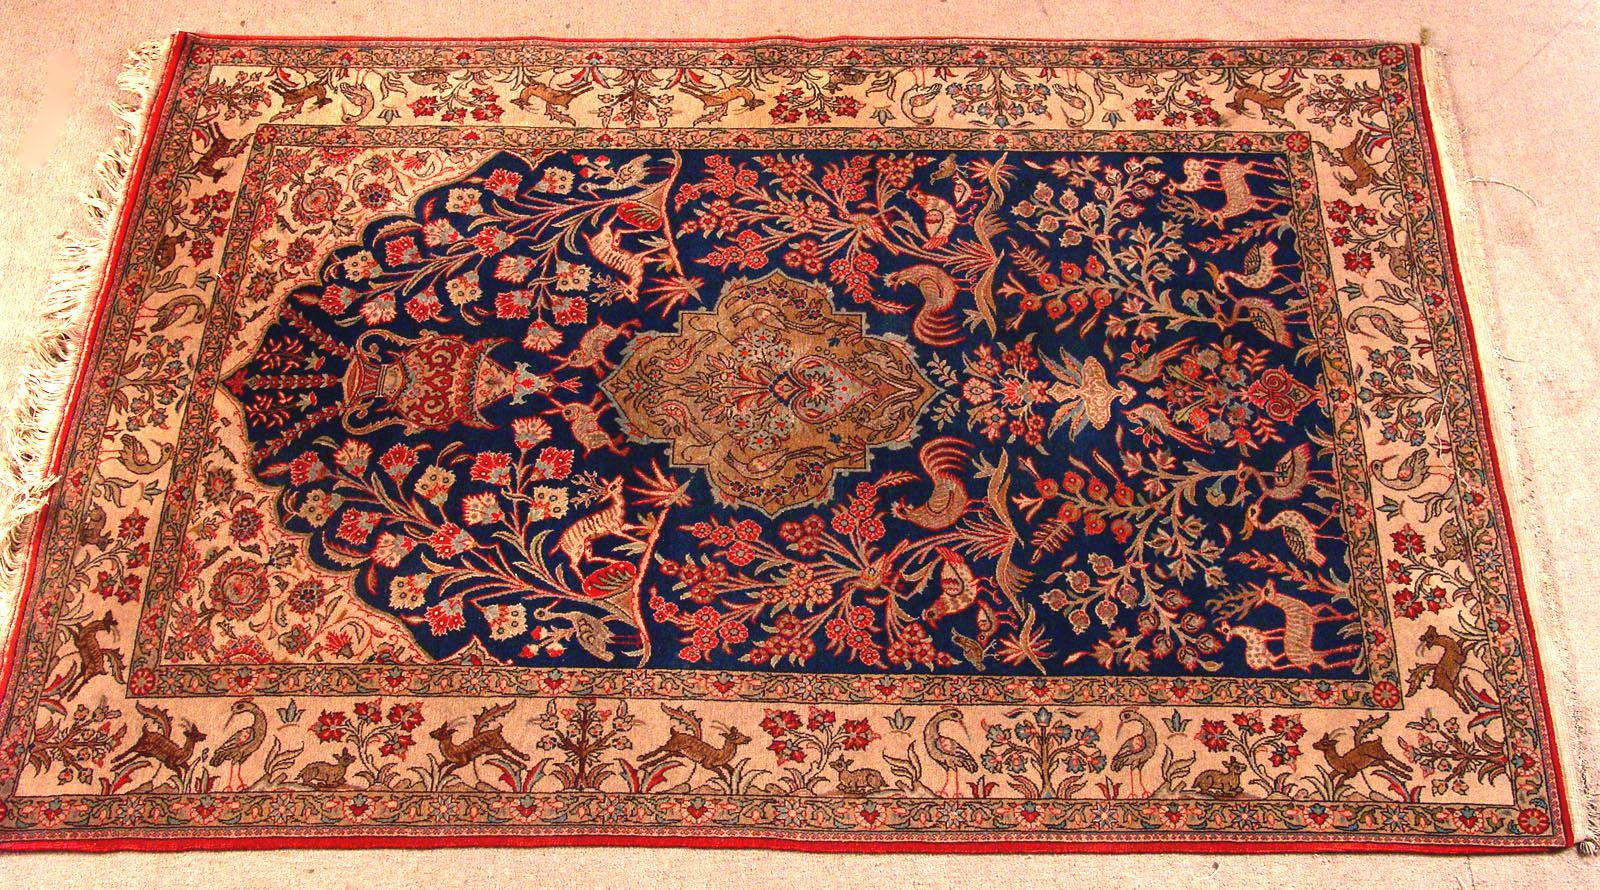 Bgw remate 241 alfombra gek htm gendata for Alfombra persa azul